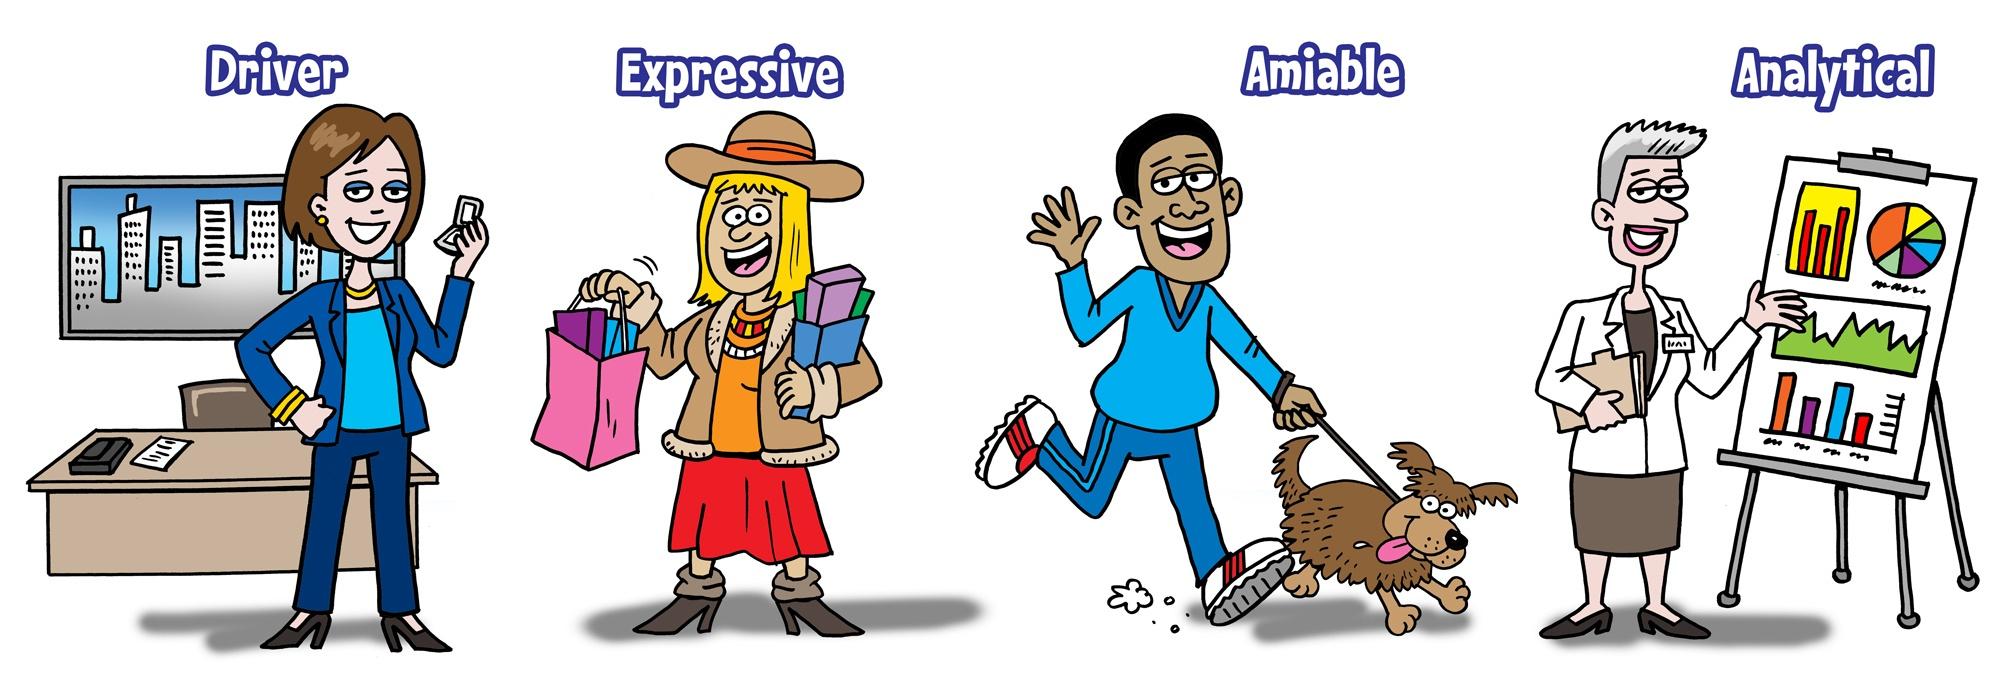 4-personality-styles-cartoon